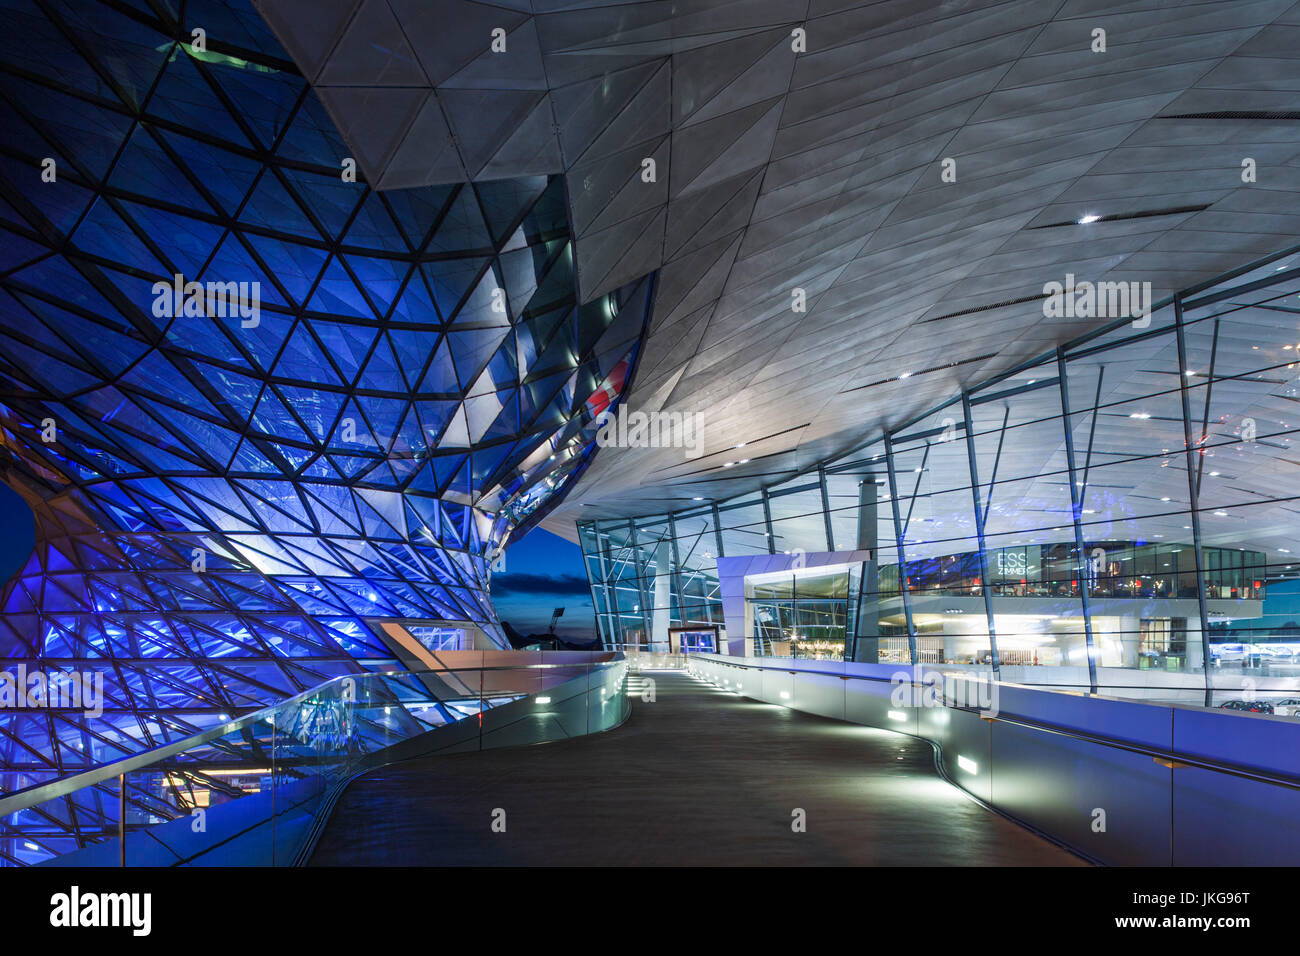 Germany, Bavaria, Munich, BMW Welt company showroom, dusk - Stock Image